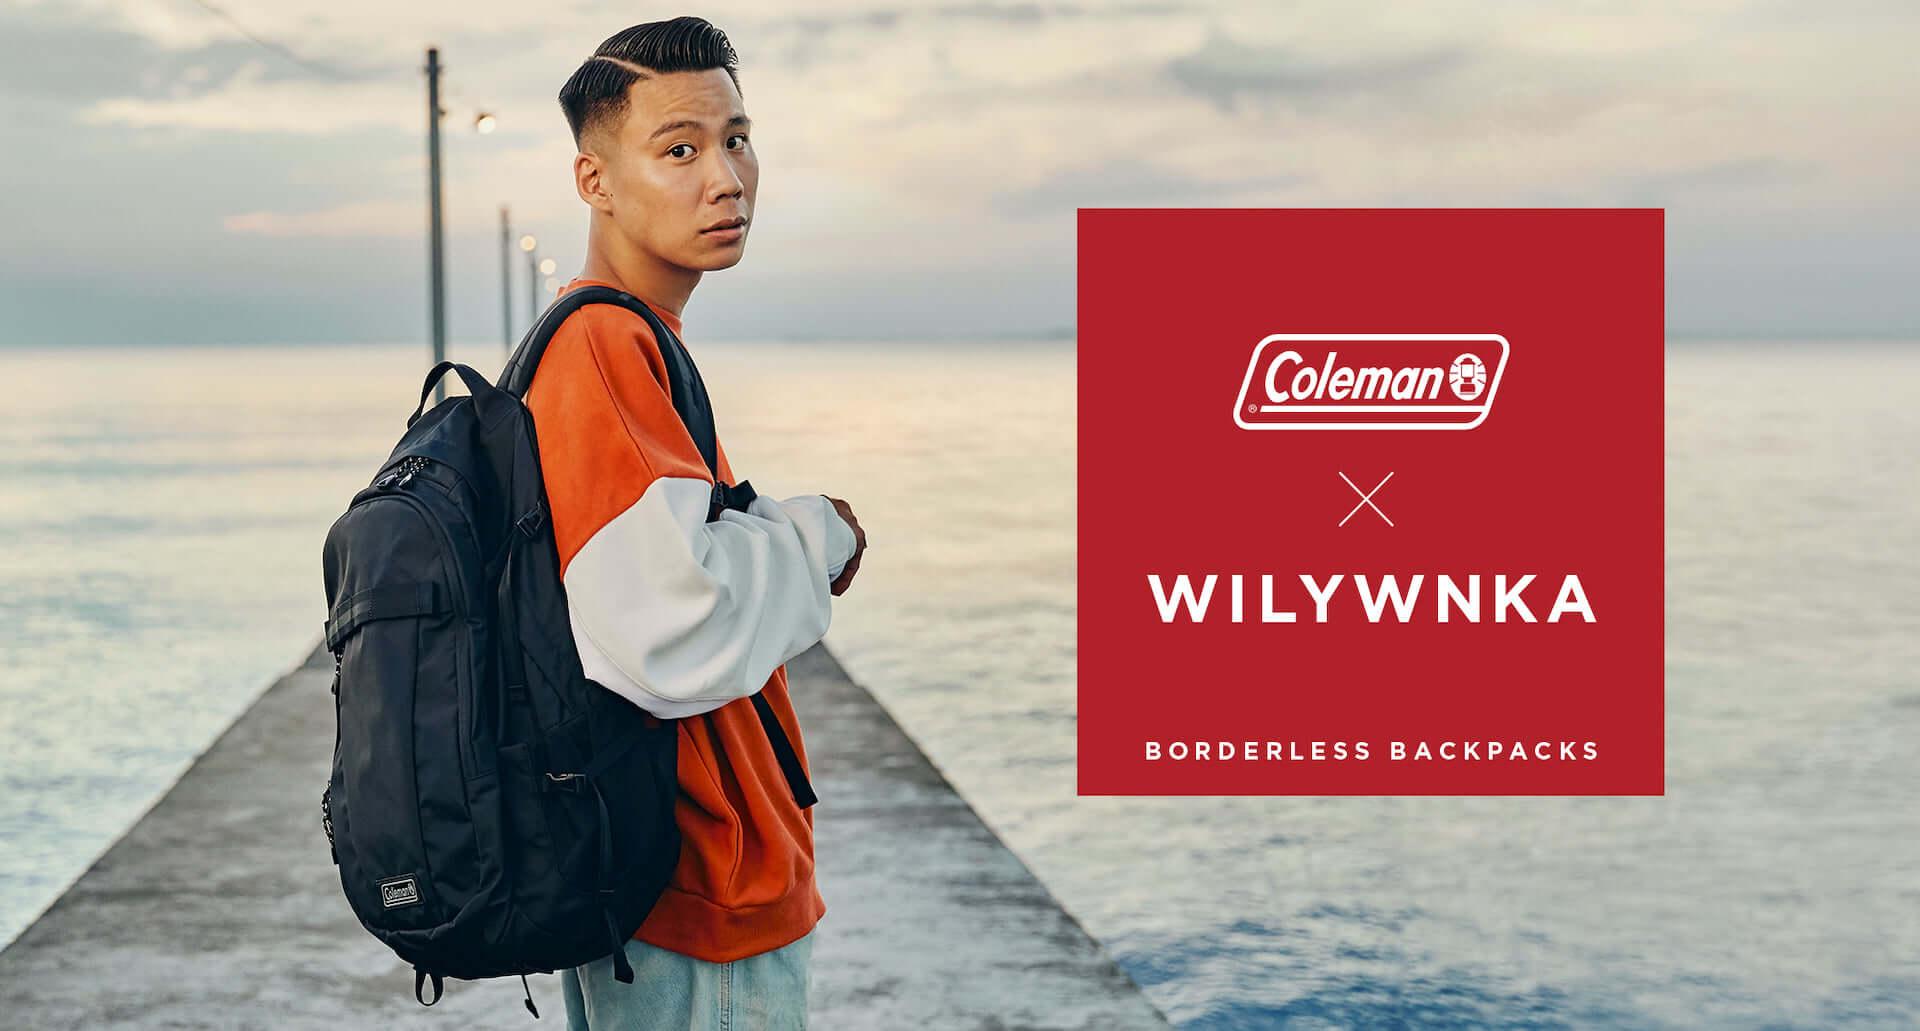 "WILYWNKAがコールマンの新作バックパックを着用!新曲""Direction By Me""のMVが公開&本人コメントも到着 music201016_coleman-wilywnka_4-1920x1031"